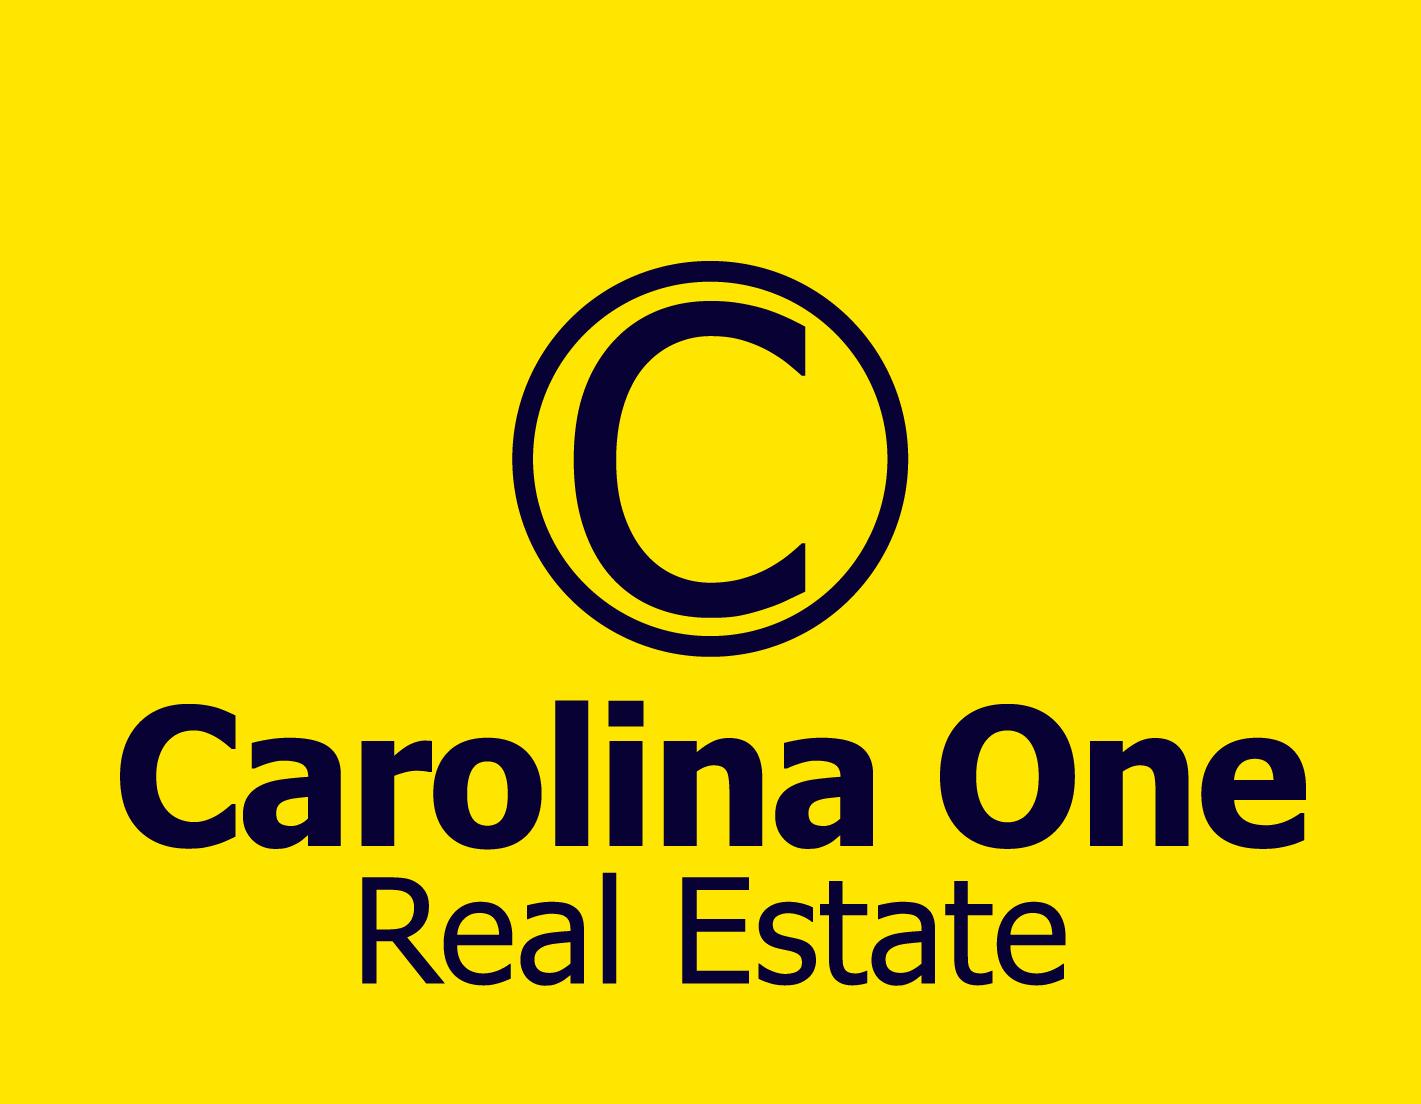 Carolina ONE